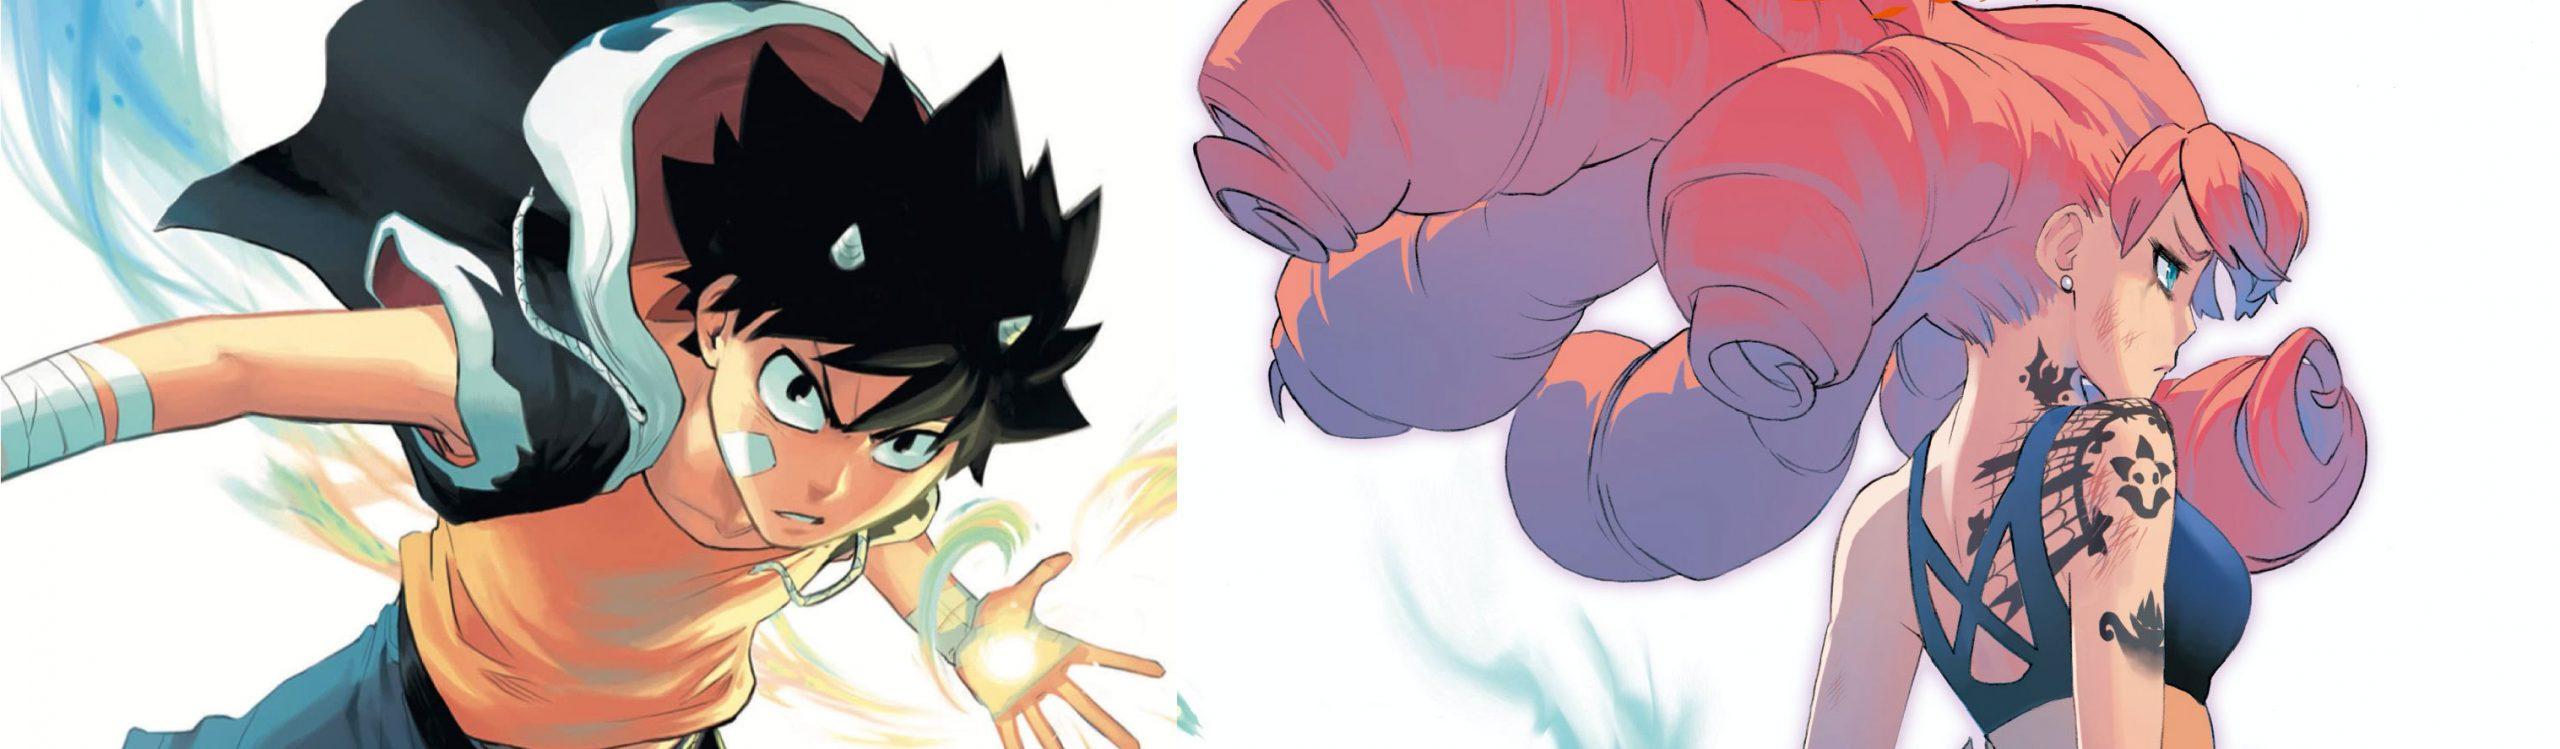 Radiant, il manga di Tony Valente